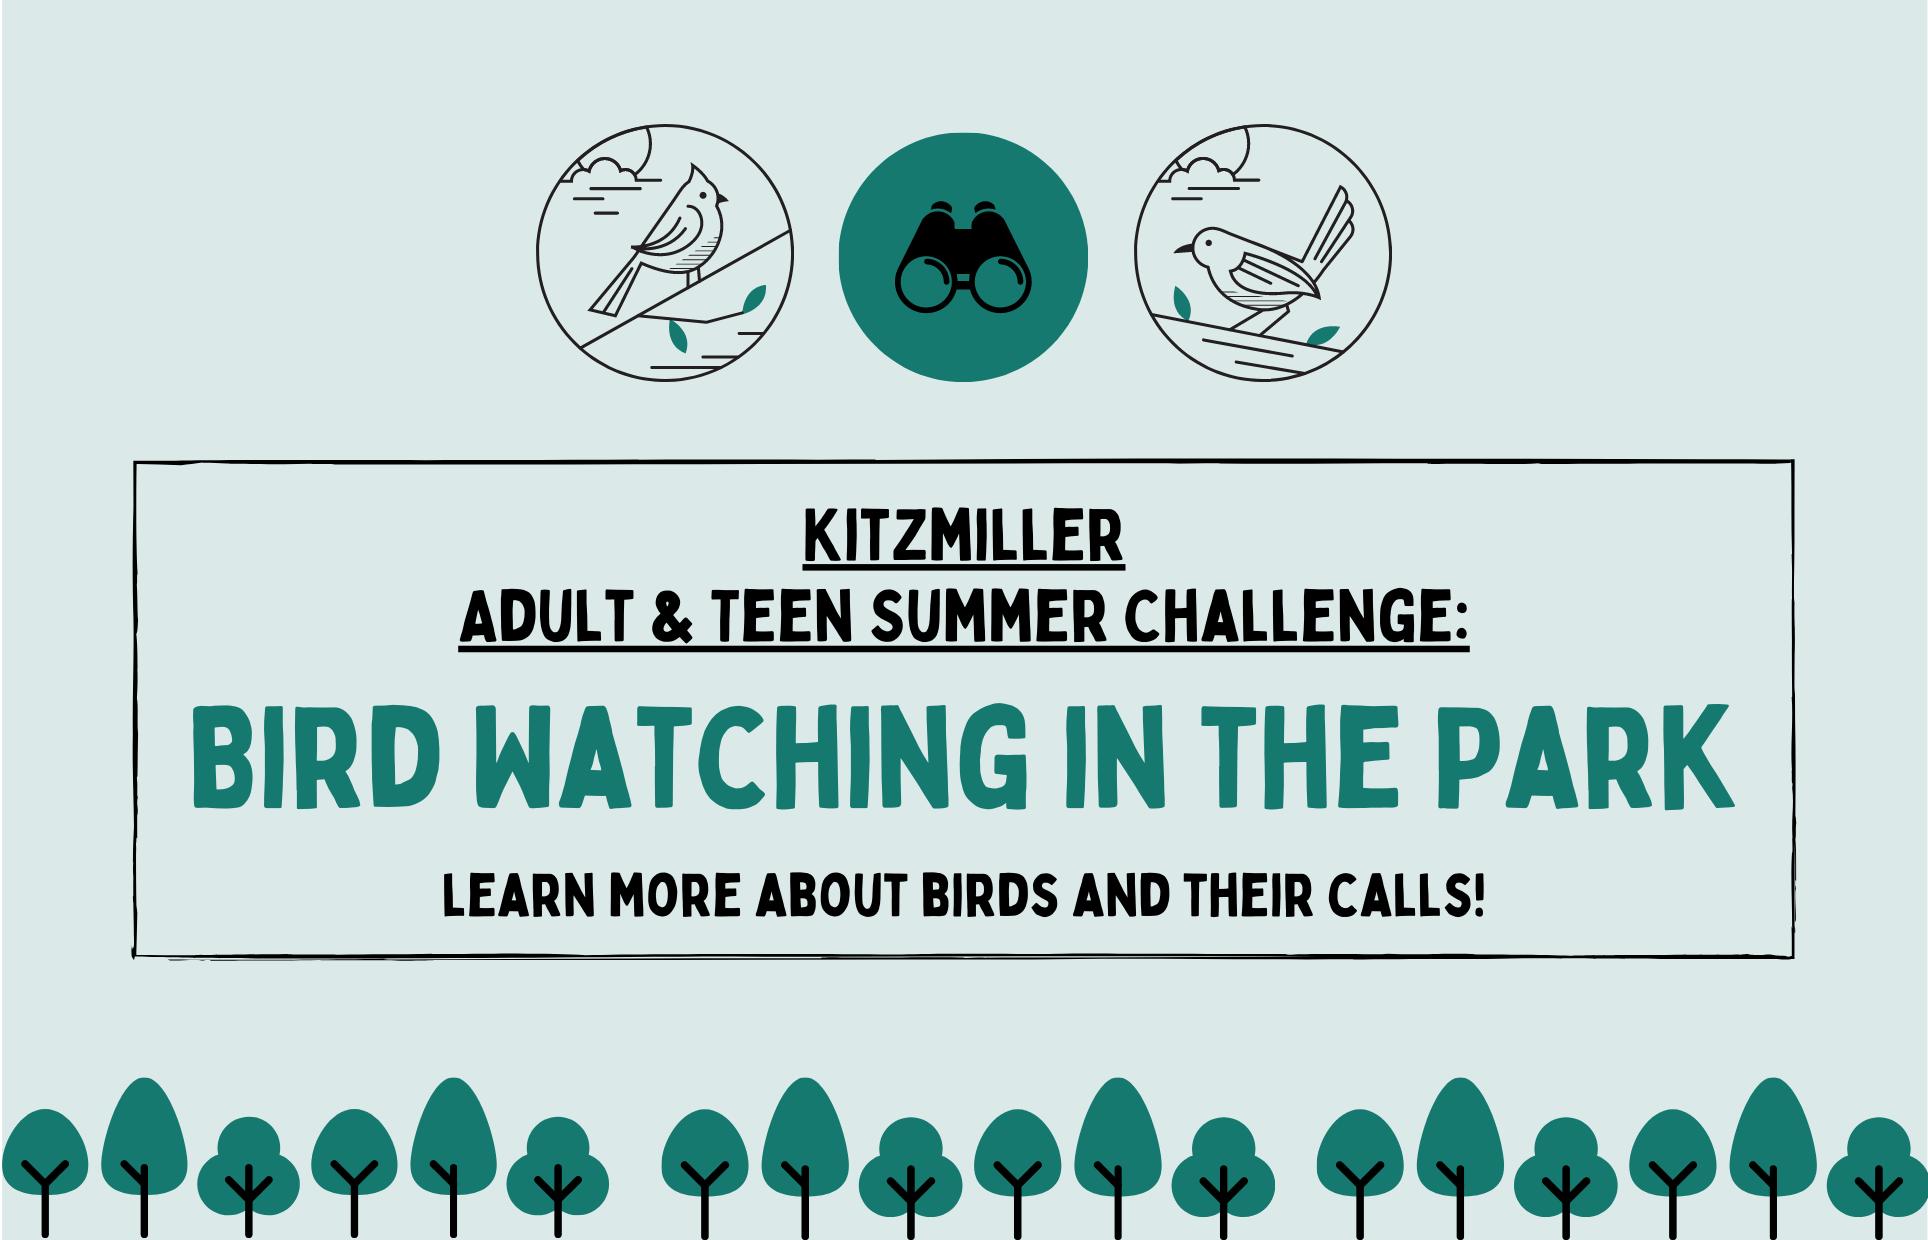 Bird Watching in the Park Kitzmiller Teen Adult